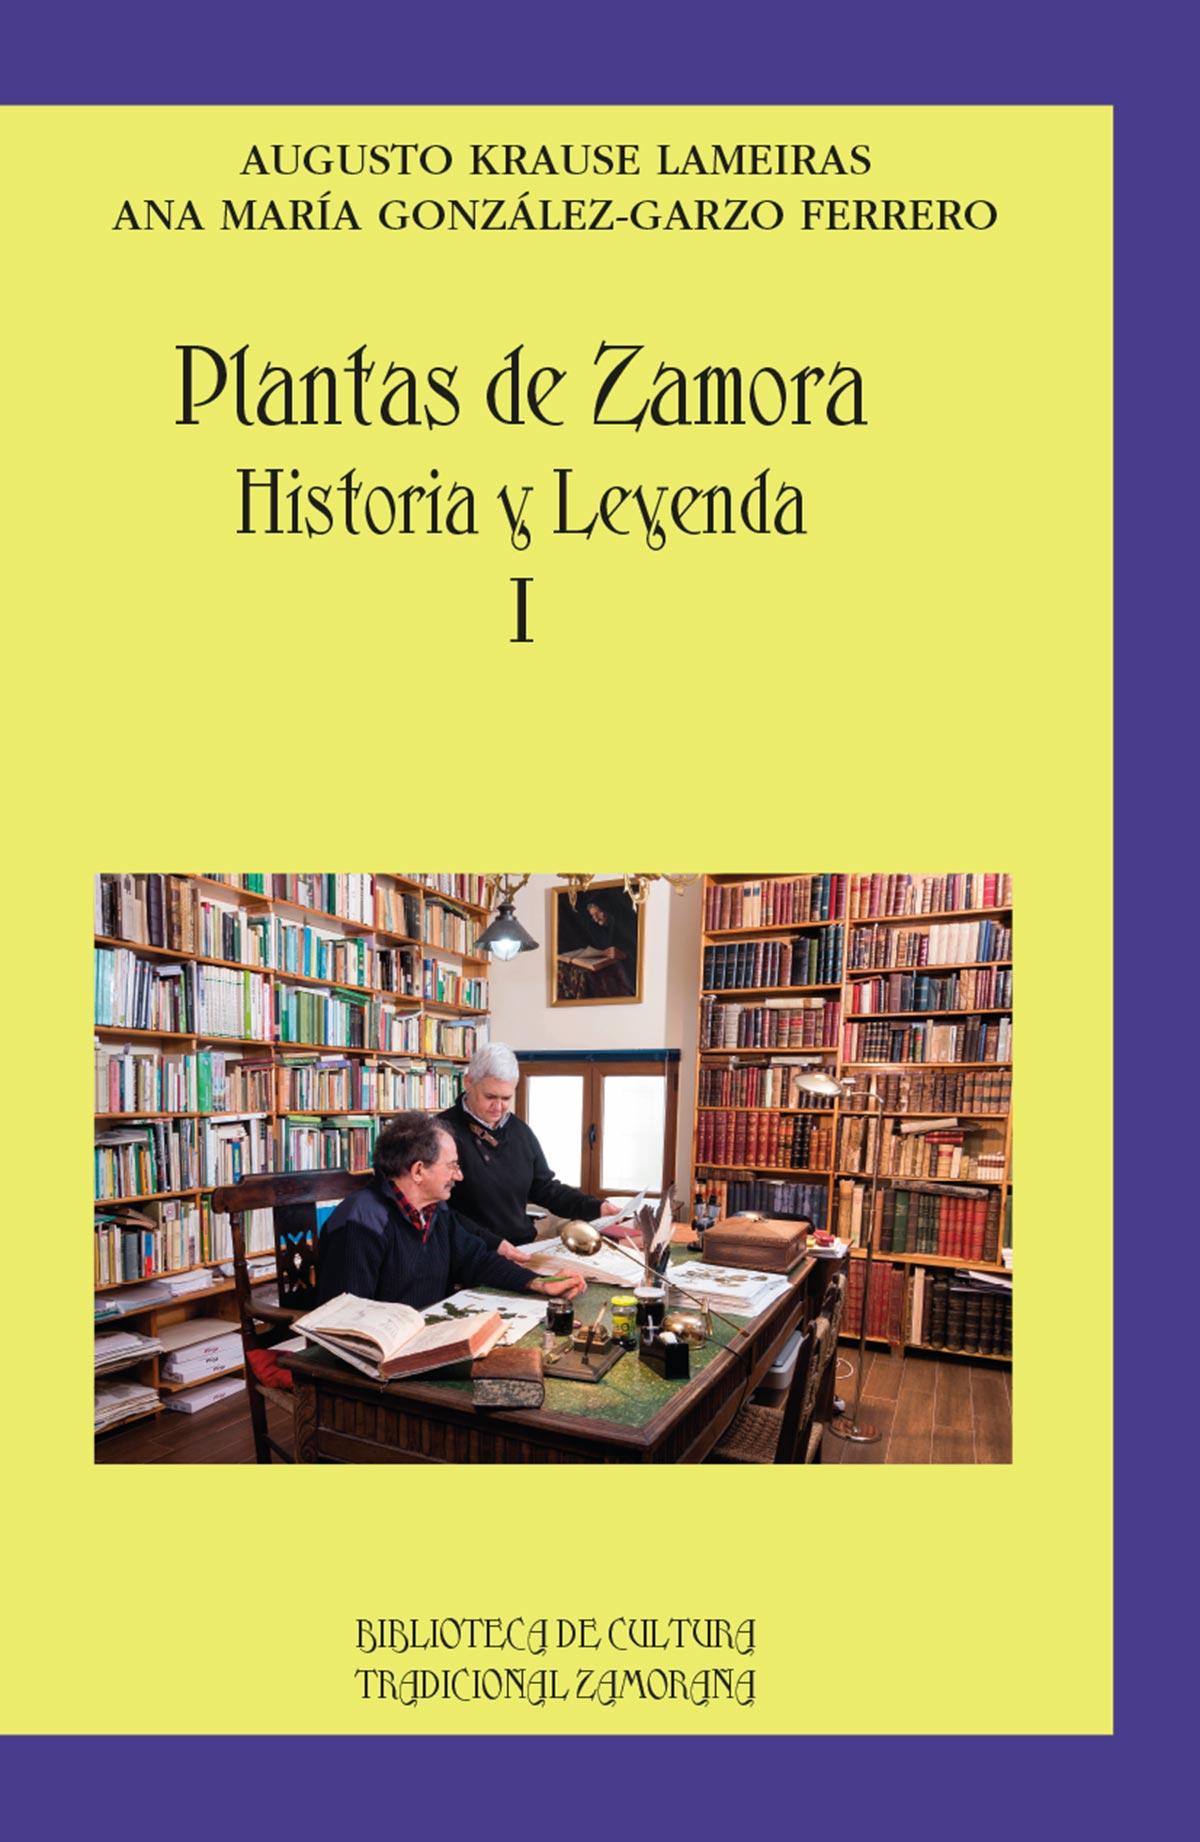 Plantas de Zamora Historia y leyenda I Editorial Semuret Augusto Krause Lameiras & Ana María González Garzo Ferrero